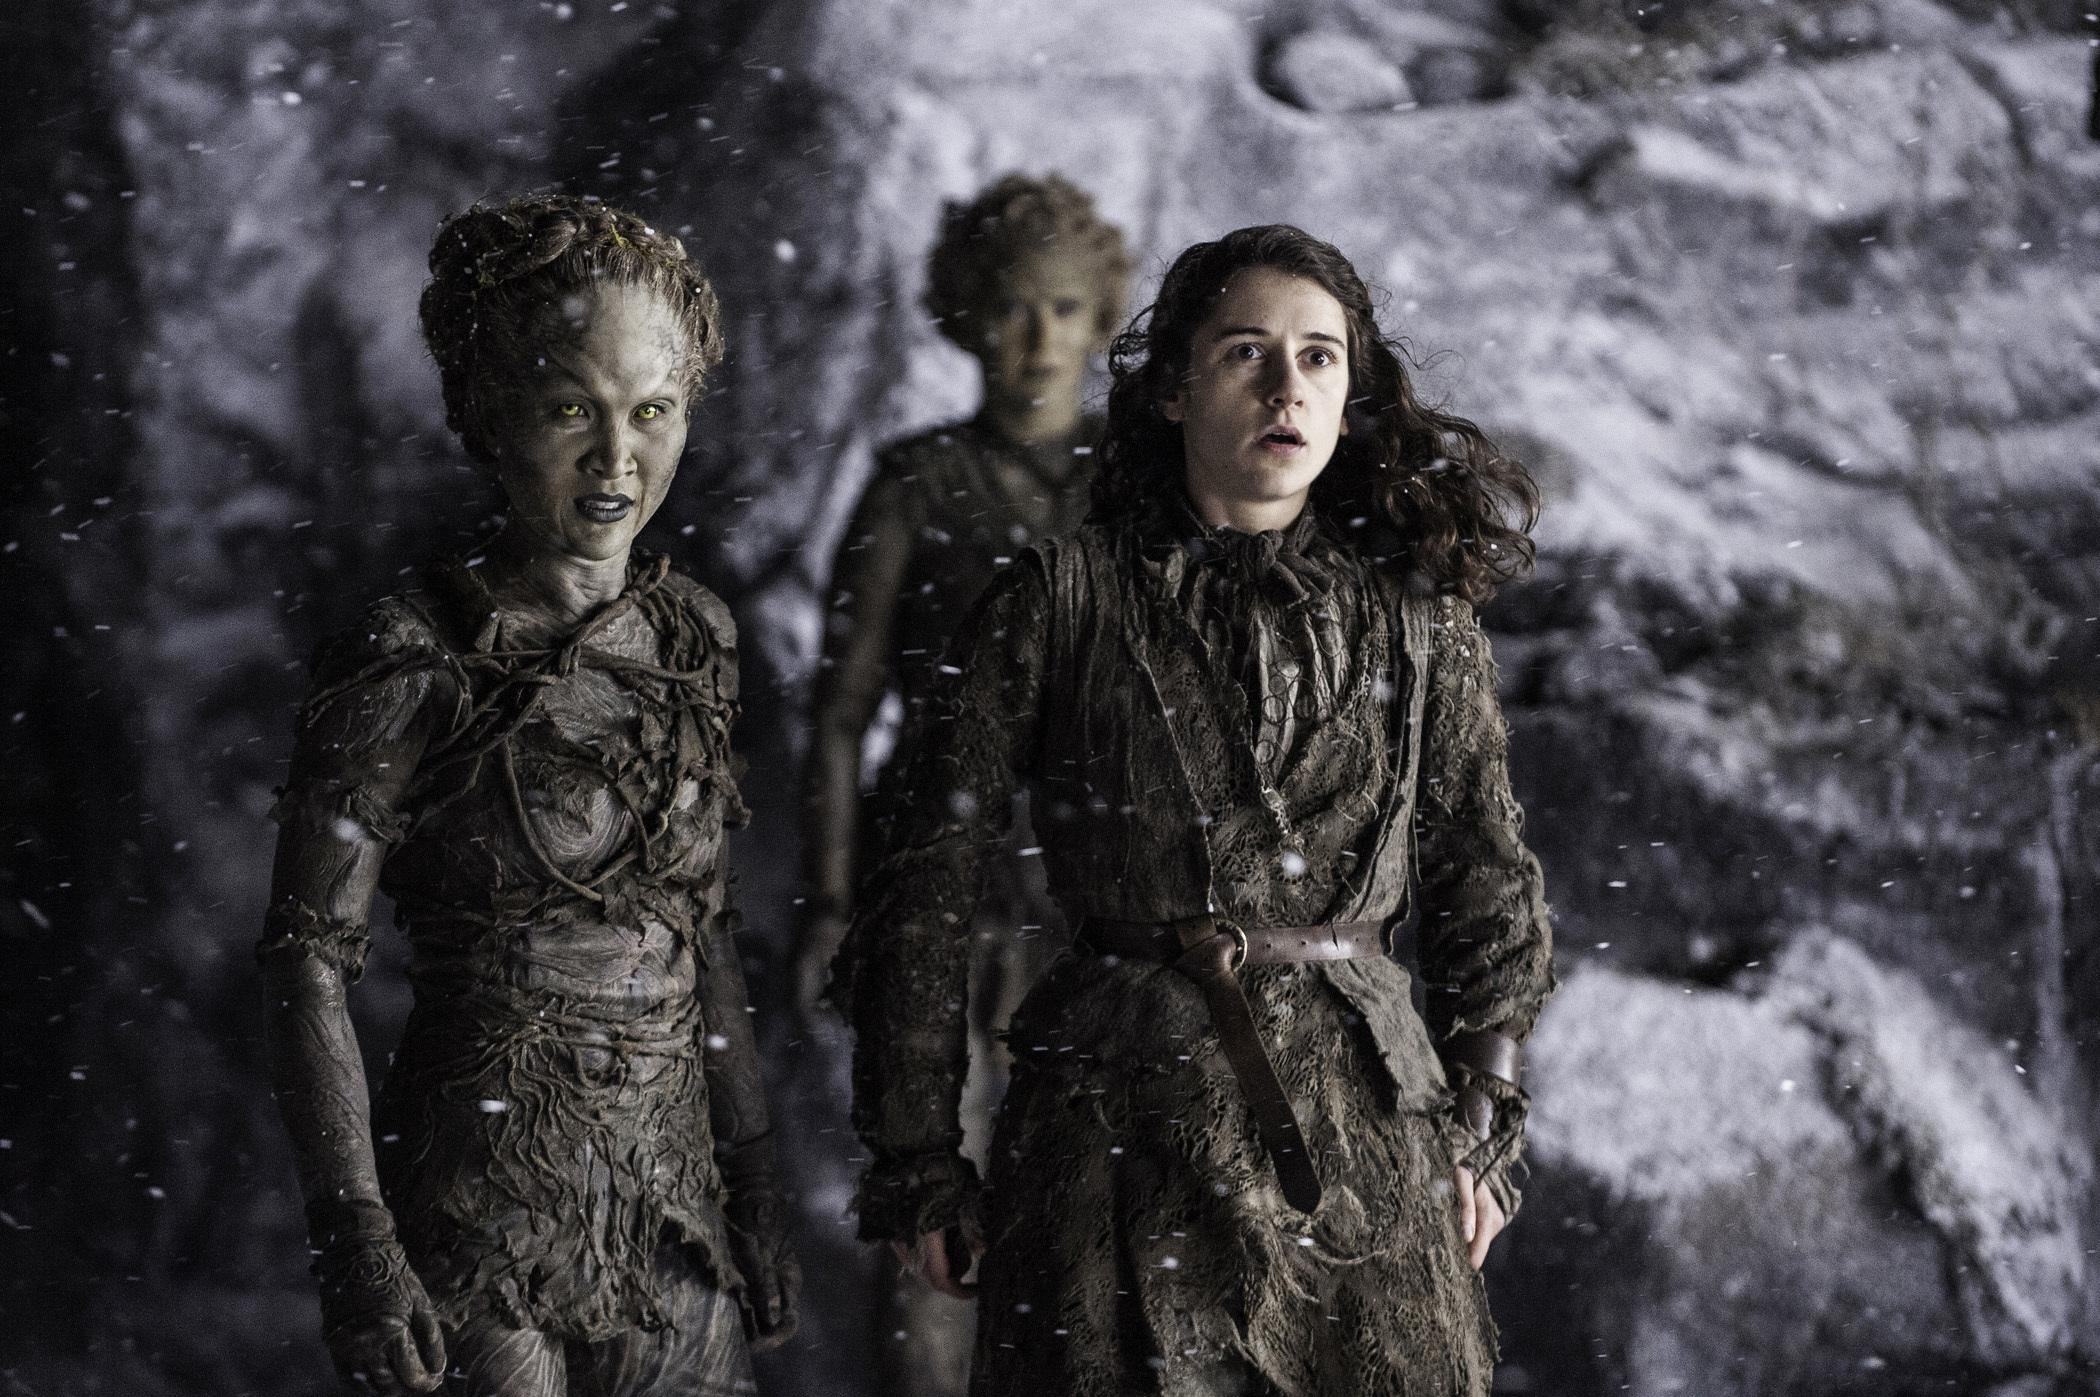 game of thrones season 6 episode 1 download 720p